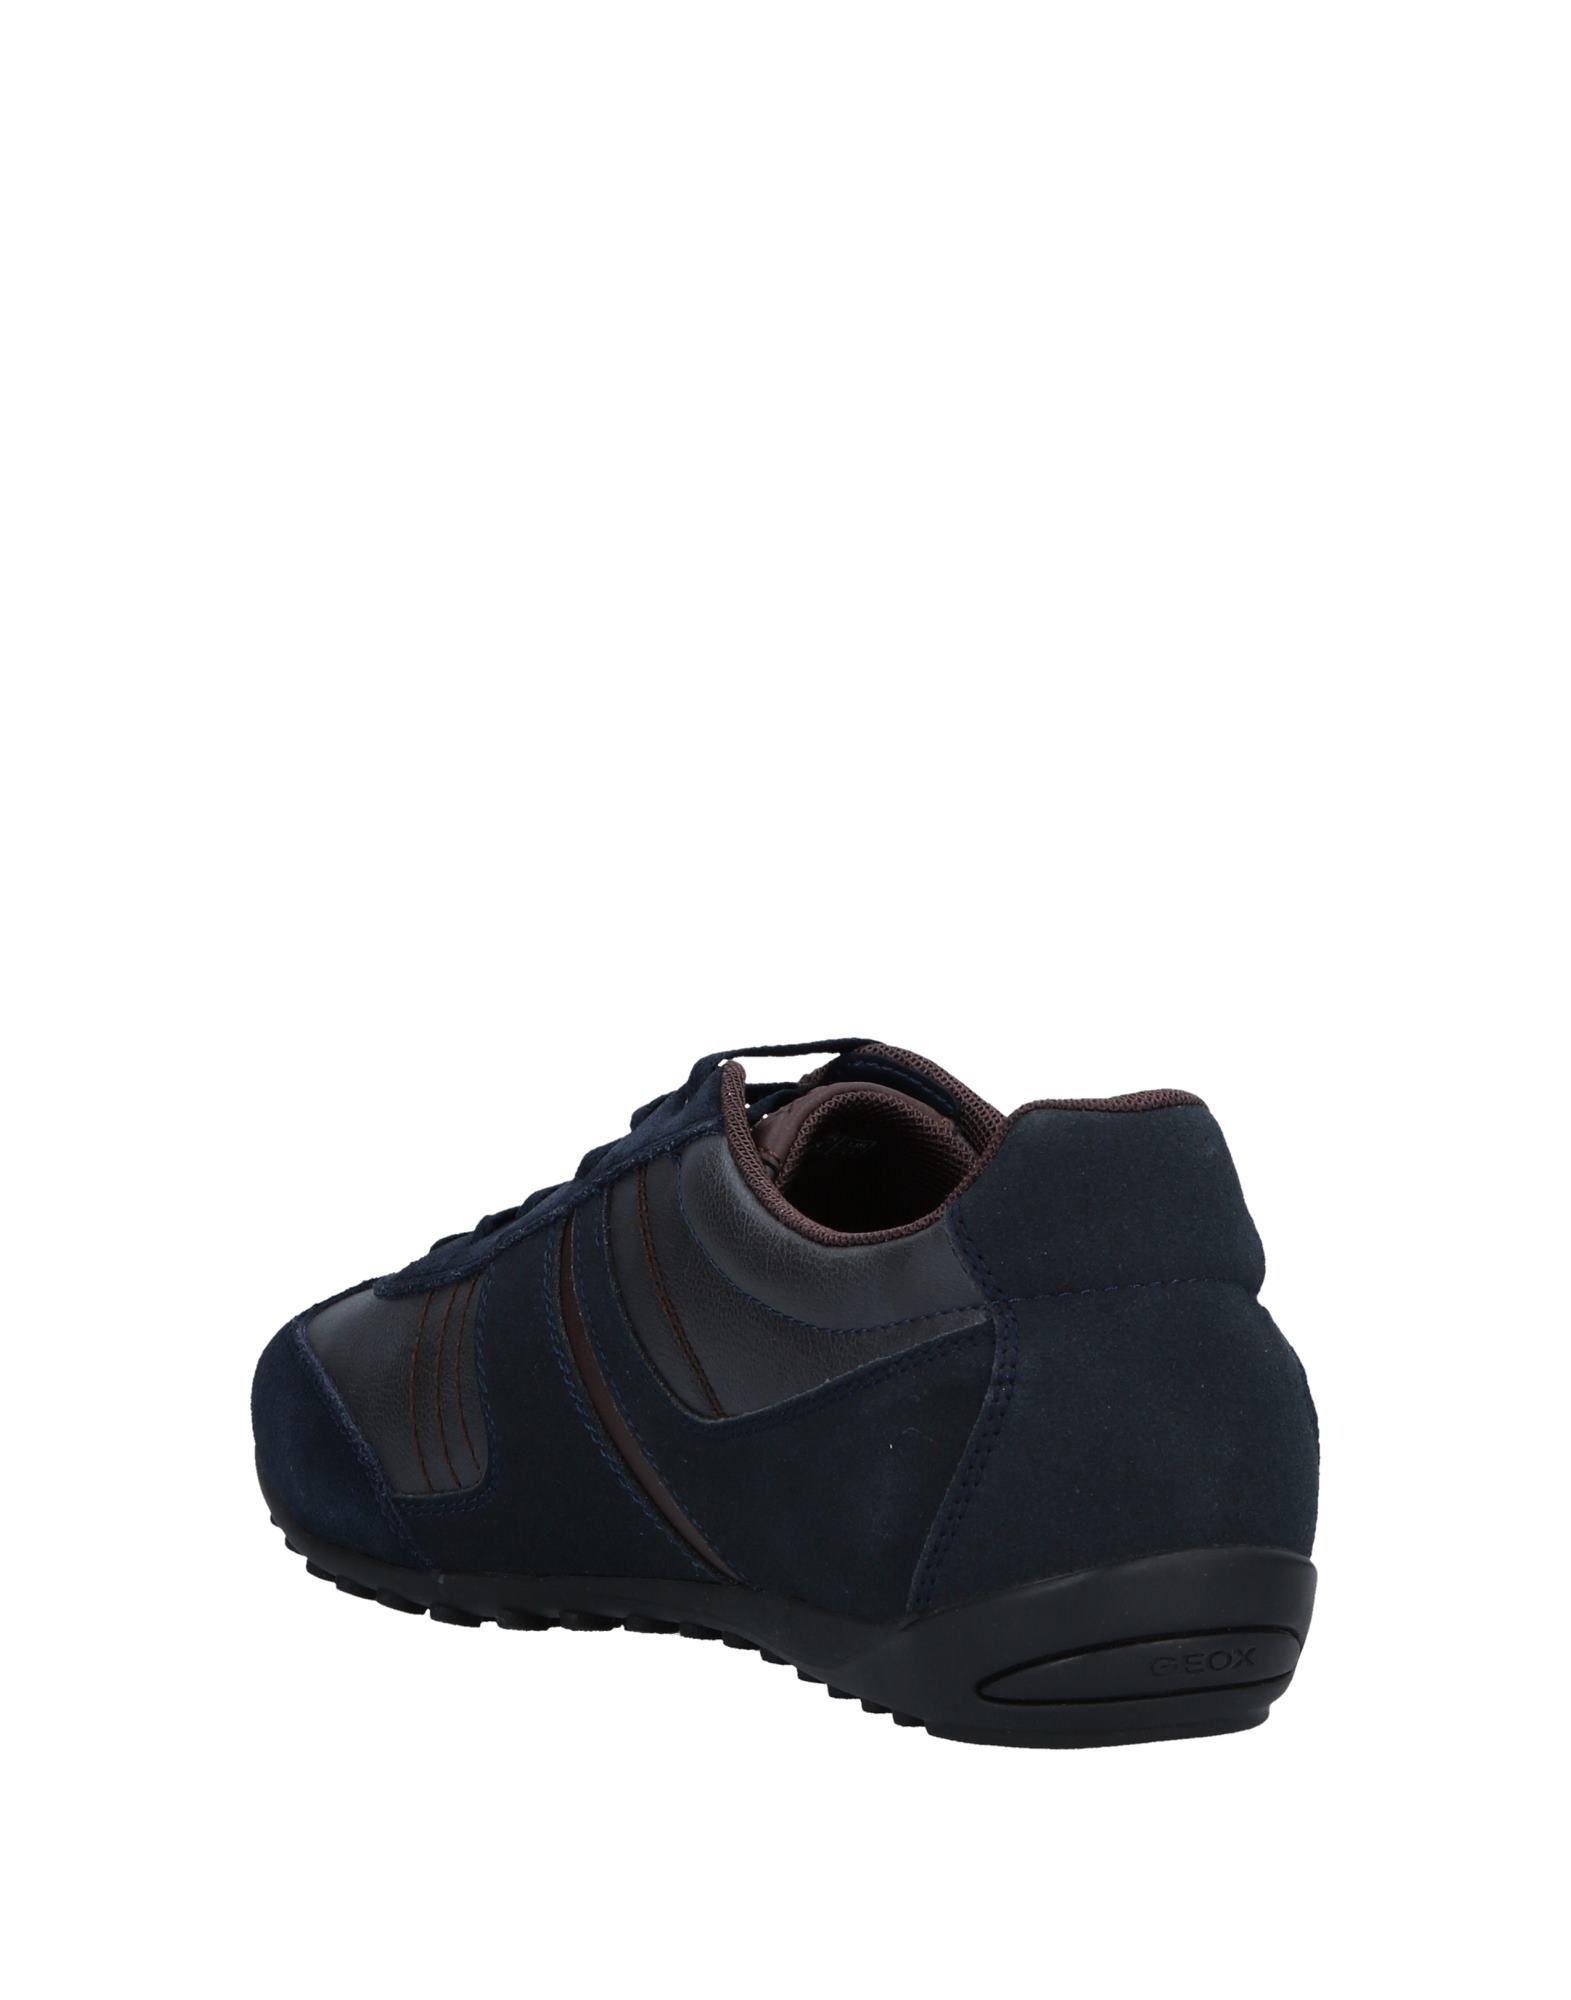 11539524FR Geox Sneakers Herren  11539524FR  Heiße Schuhe 6dee35